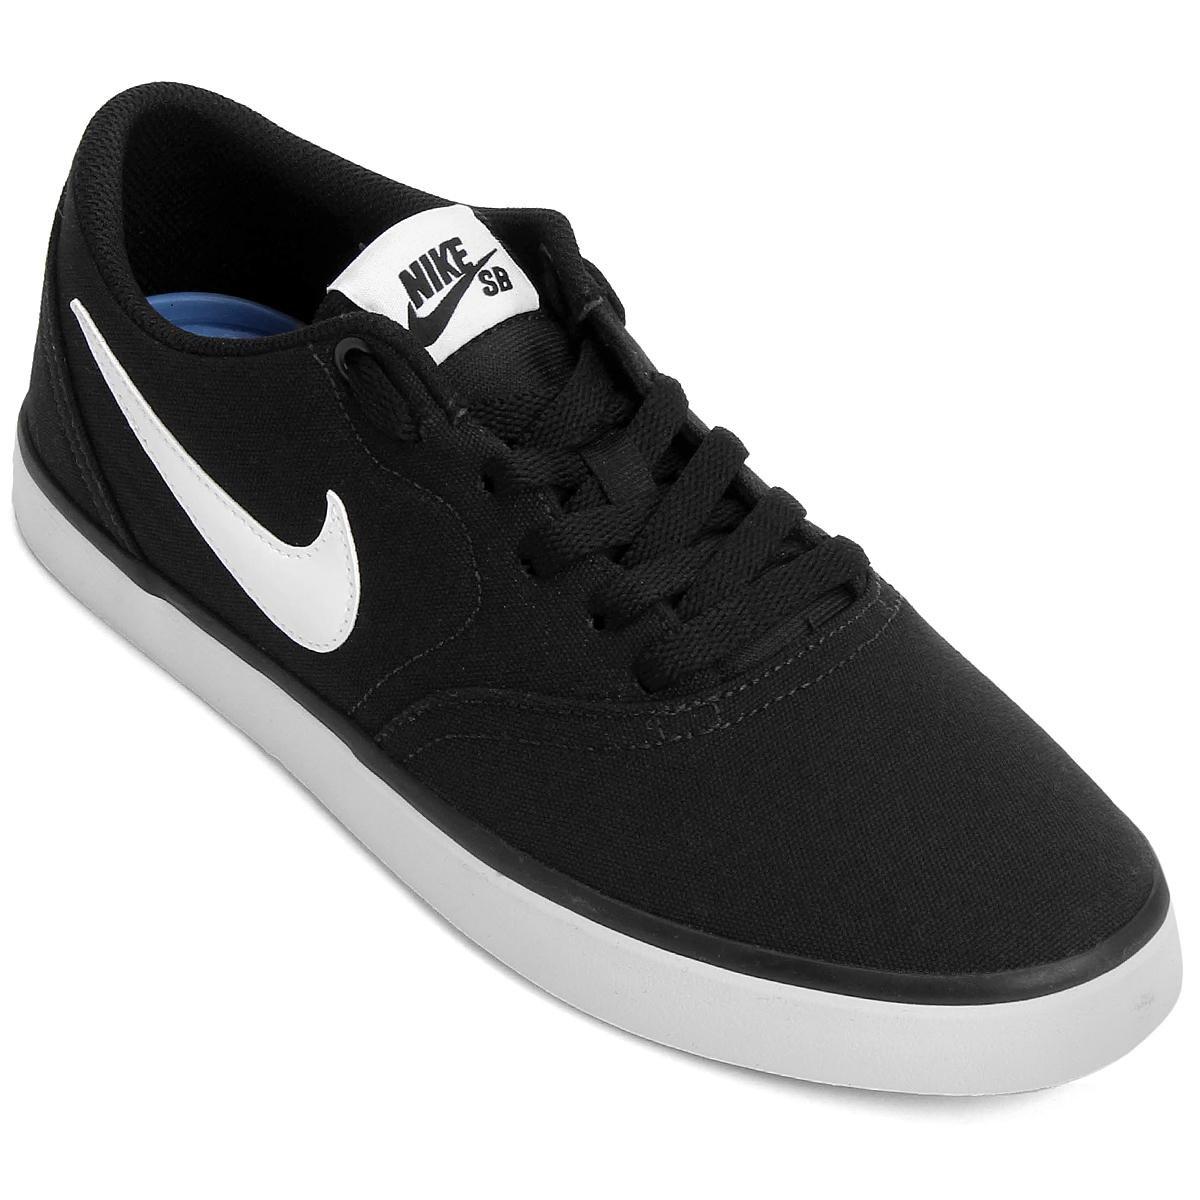 Tênis Nike Cnvs Sb Check Solar Cnvs Nike Masculino Compre Agora f5a711 7c3cd34311